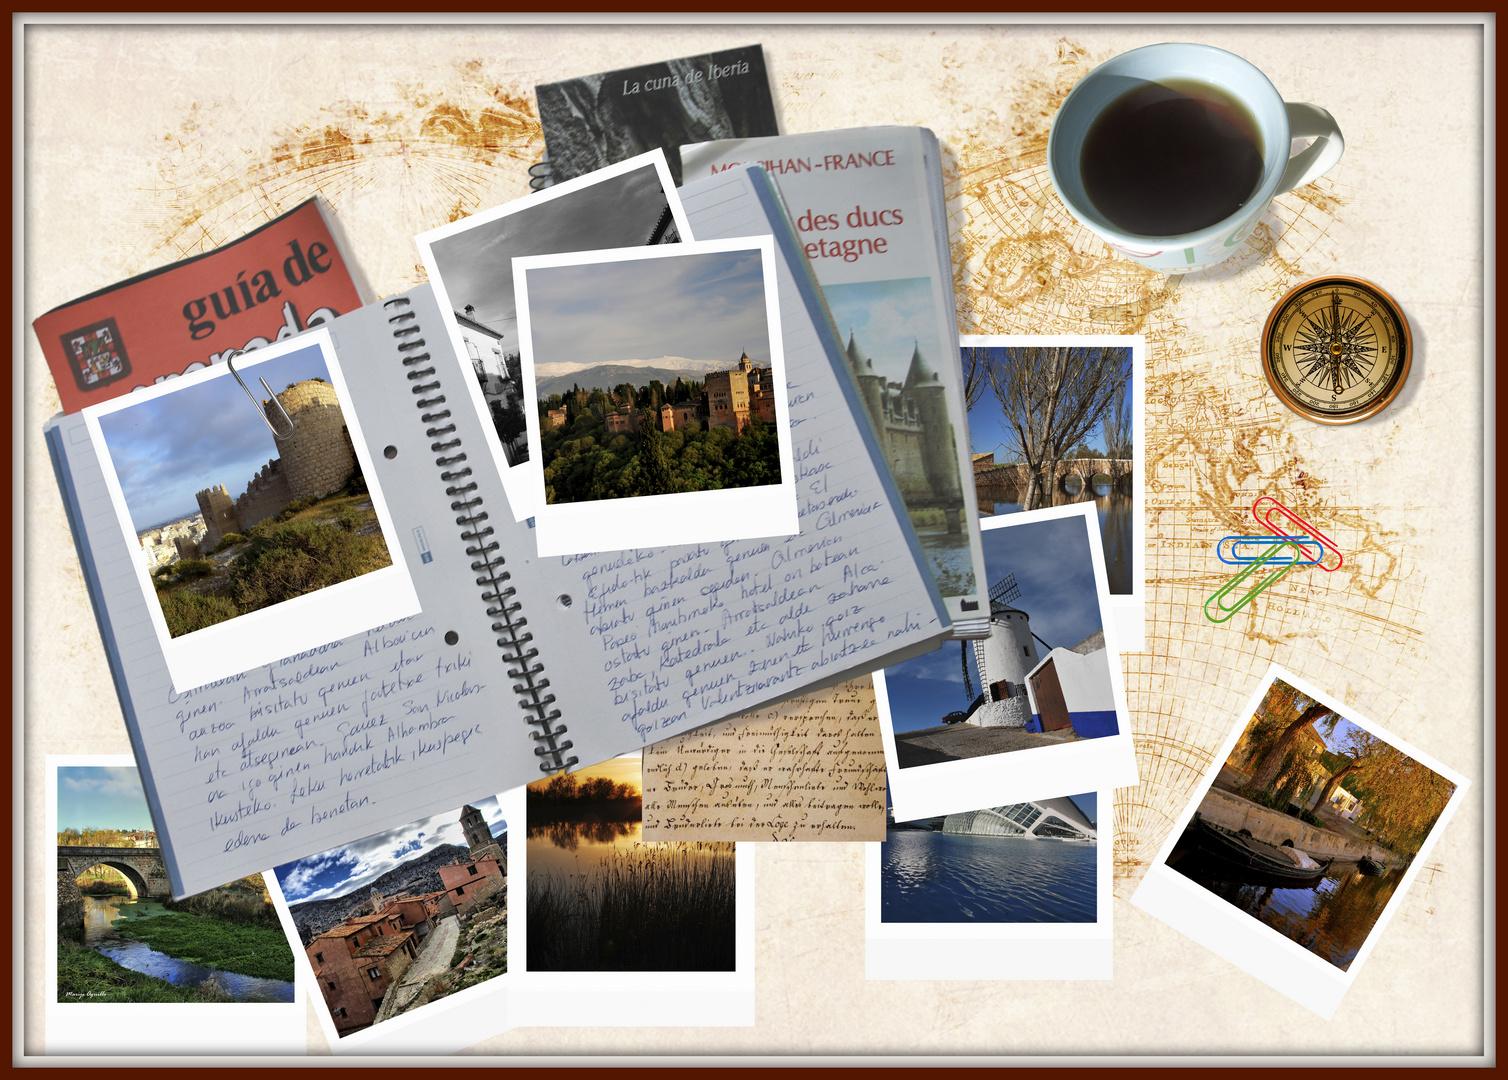 Nire bidai-koadoernoa - Mi cuaderno de viaje